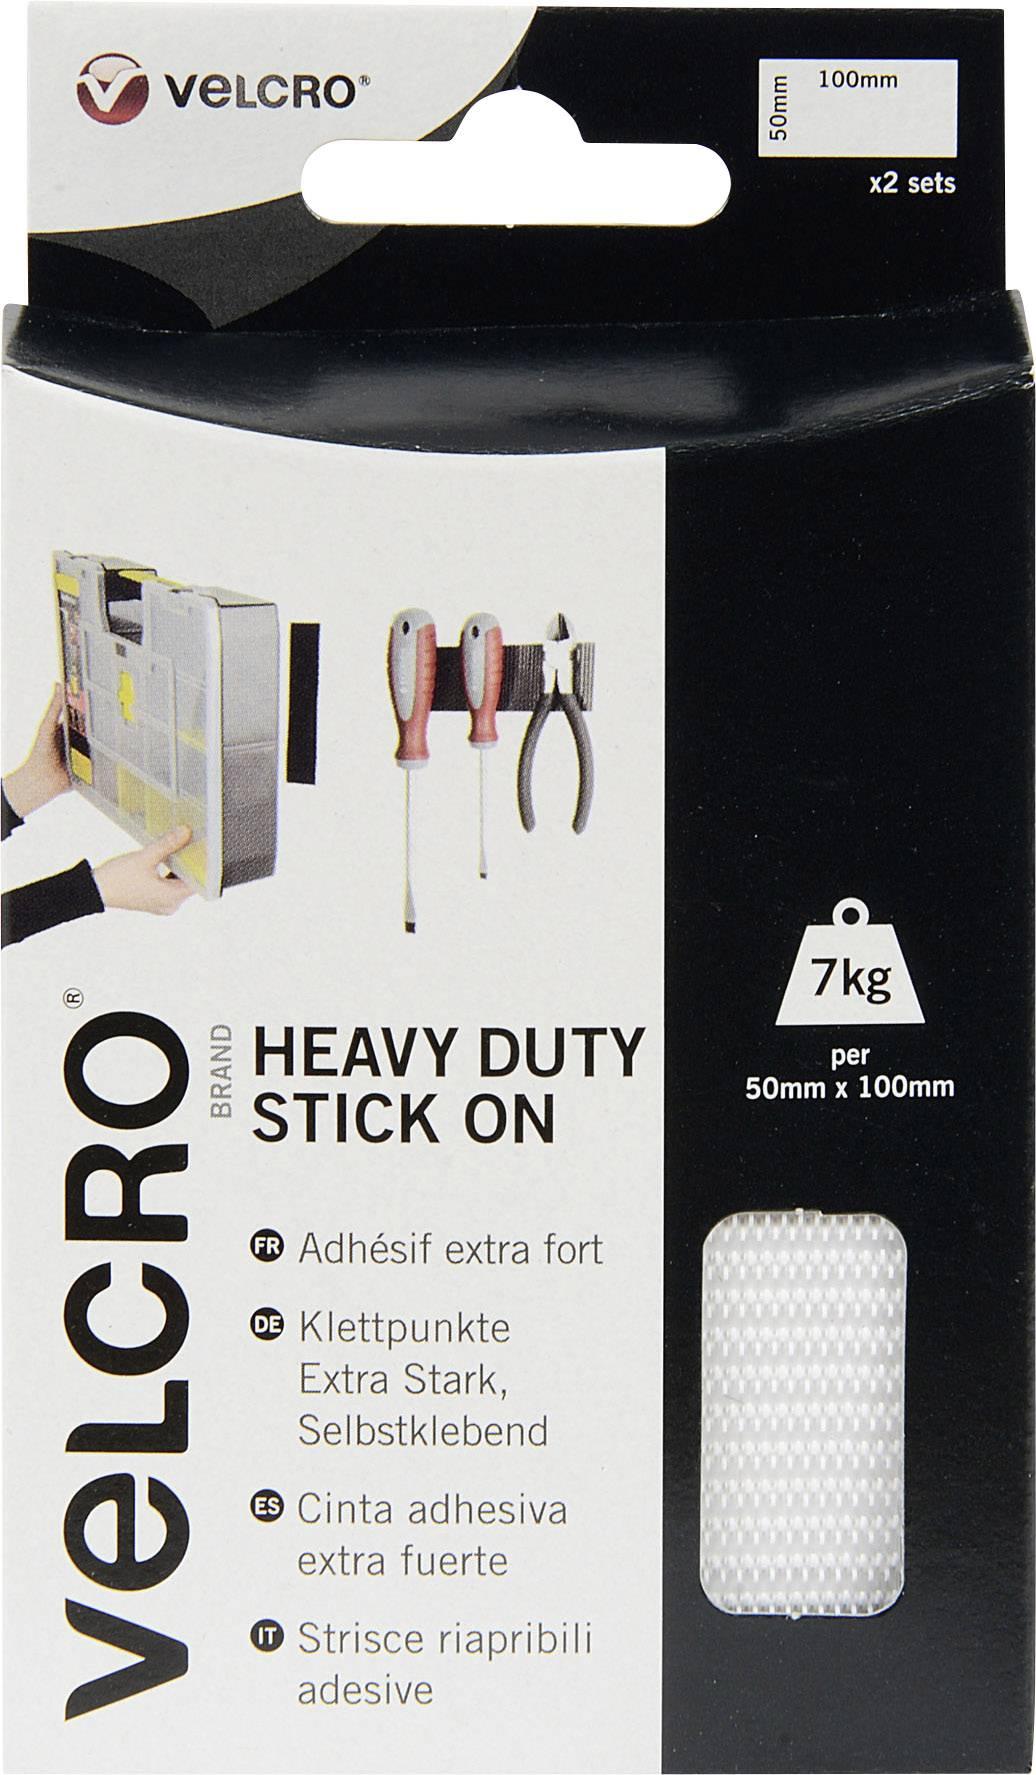 Lepiaci pásik so suchým zipsom VELCRO® brand VEL-EC60240, (d x š) 100 mm x 50 mm, biela, 2 pár